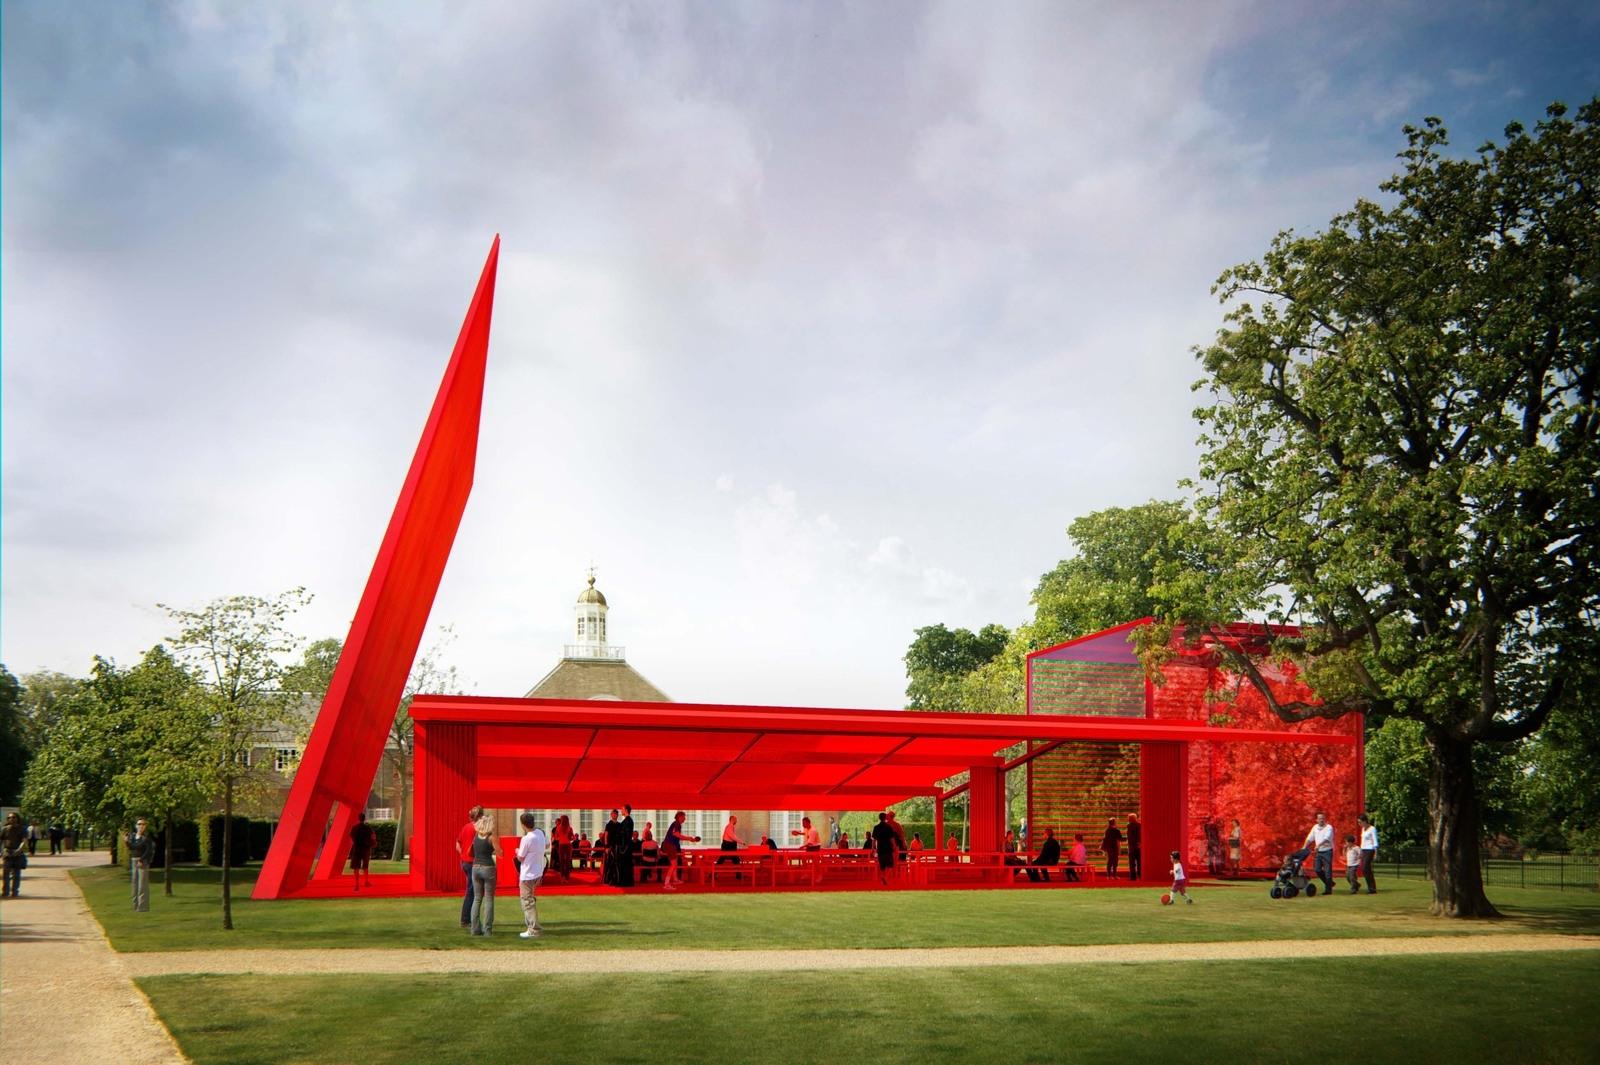 Serpentine Gallery Pavilion 2010 image